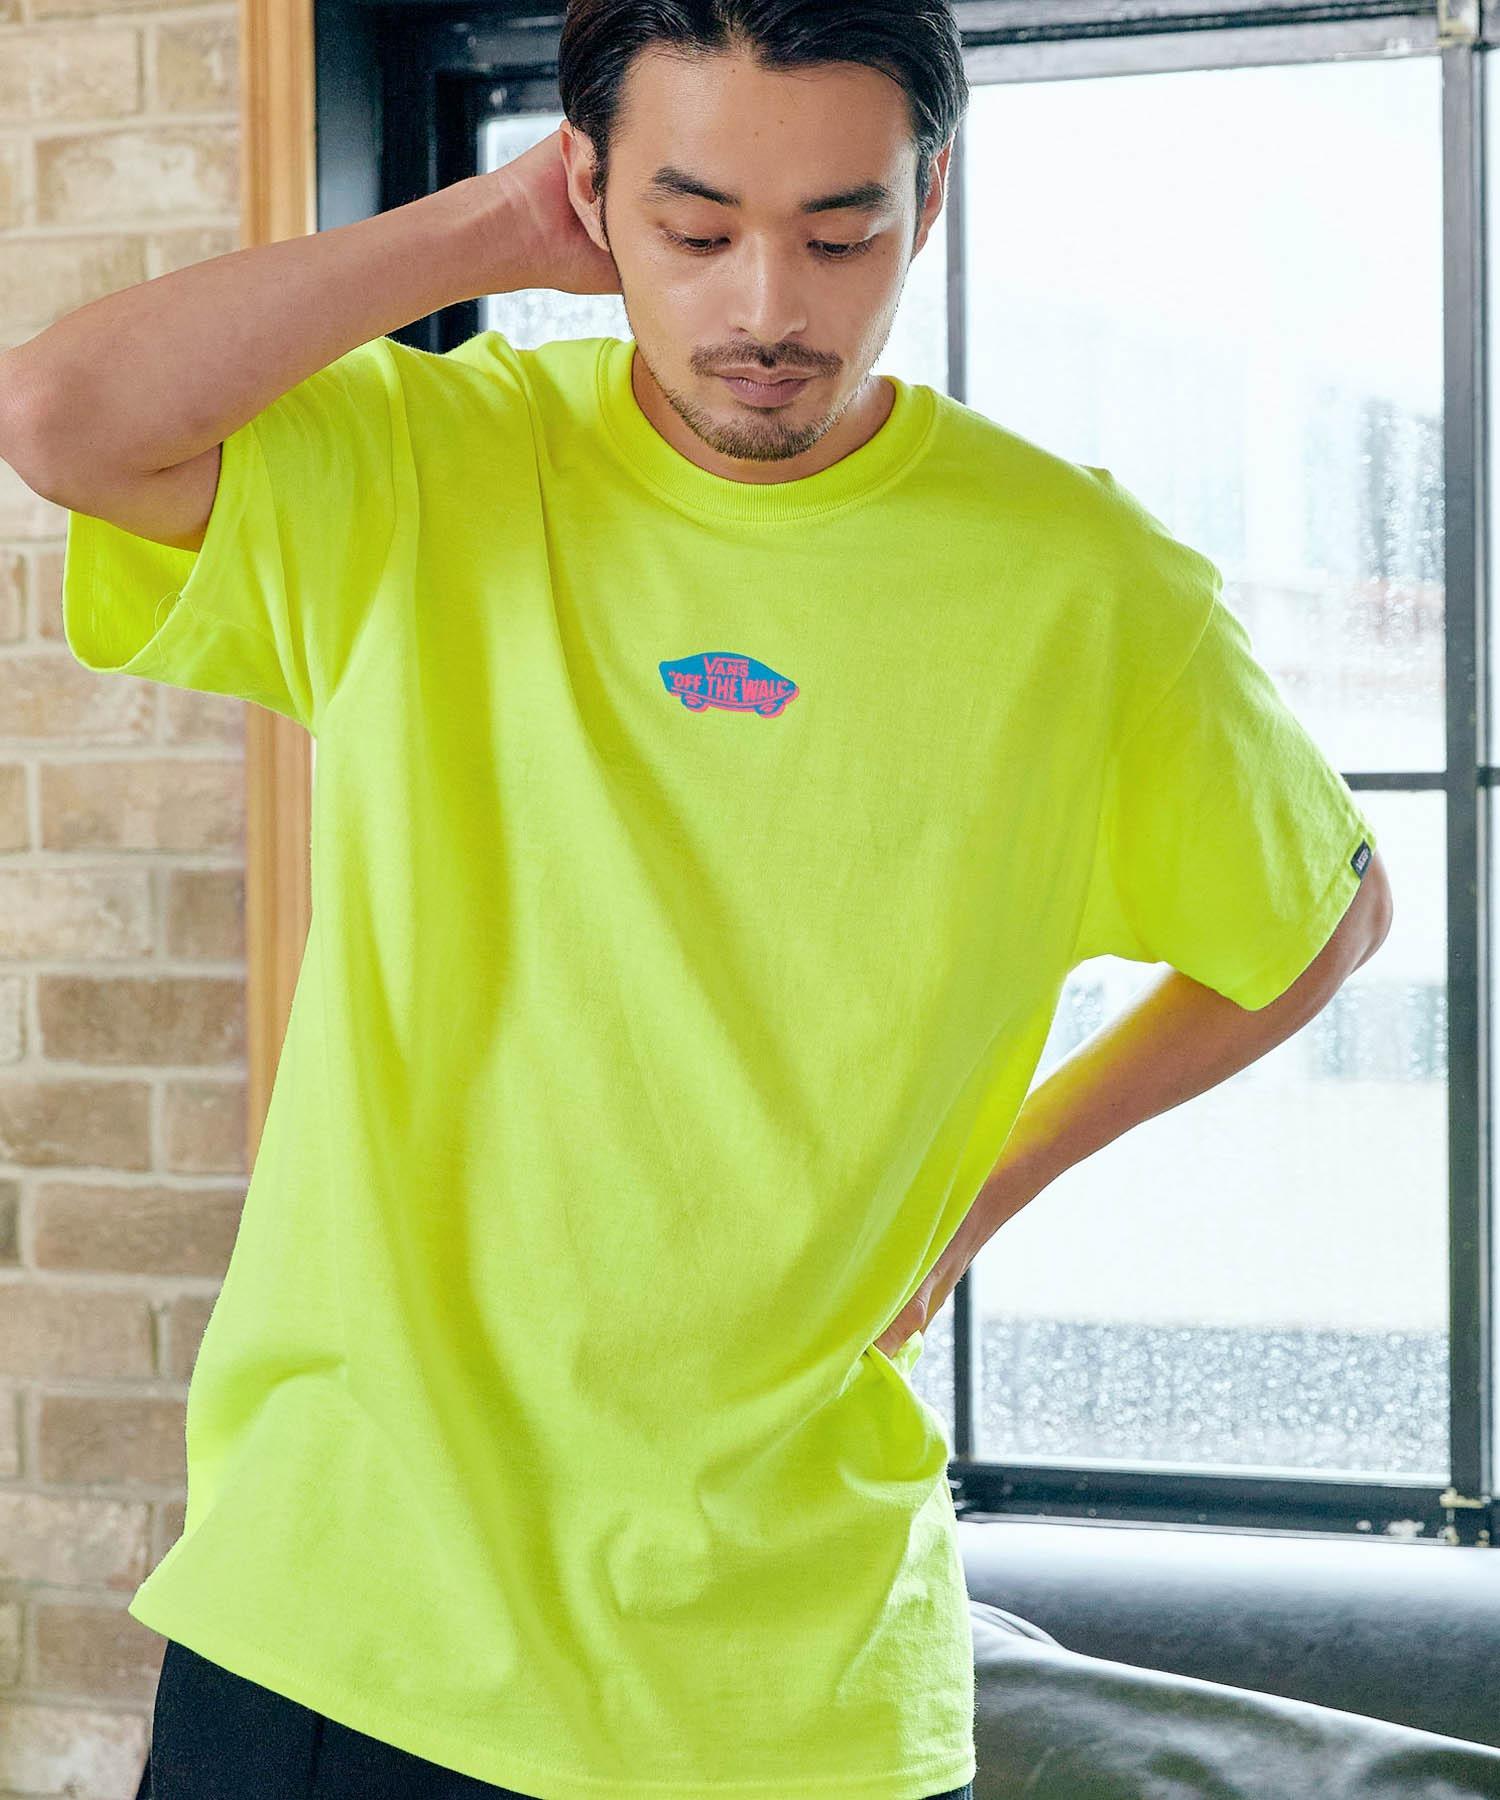 VANS/ヴァンズ Neon OTW S/S T-Shirt ネオンオフザウォールプリント半袖Tシャツ